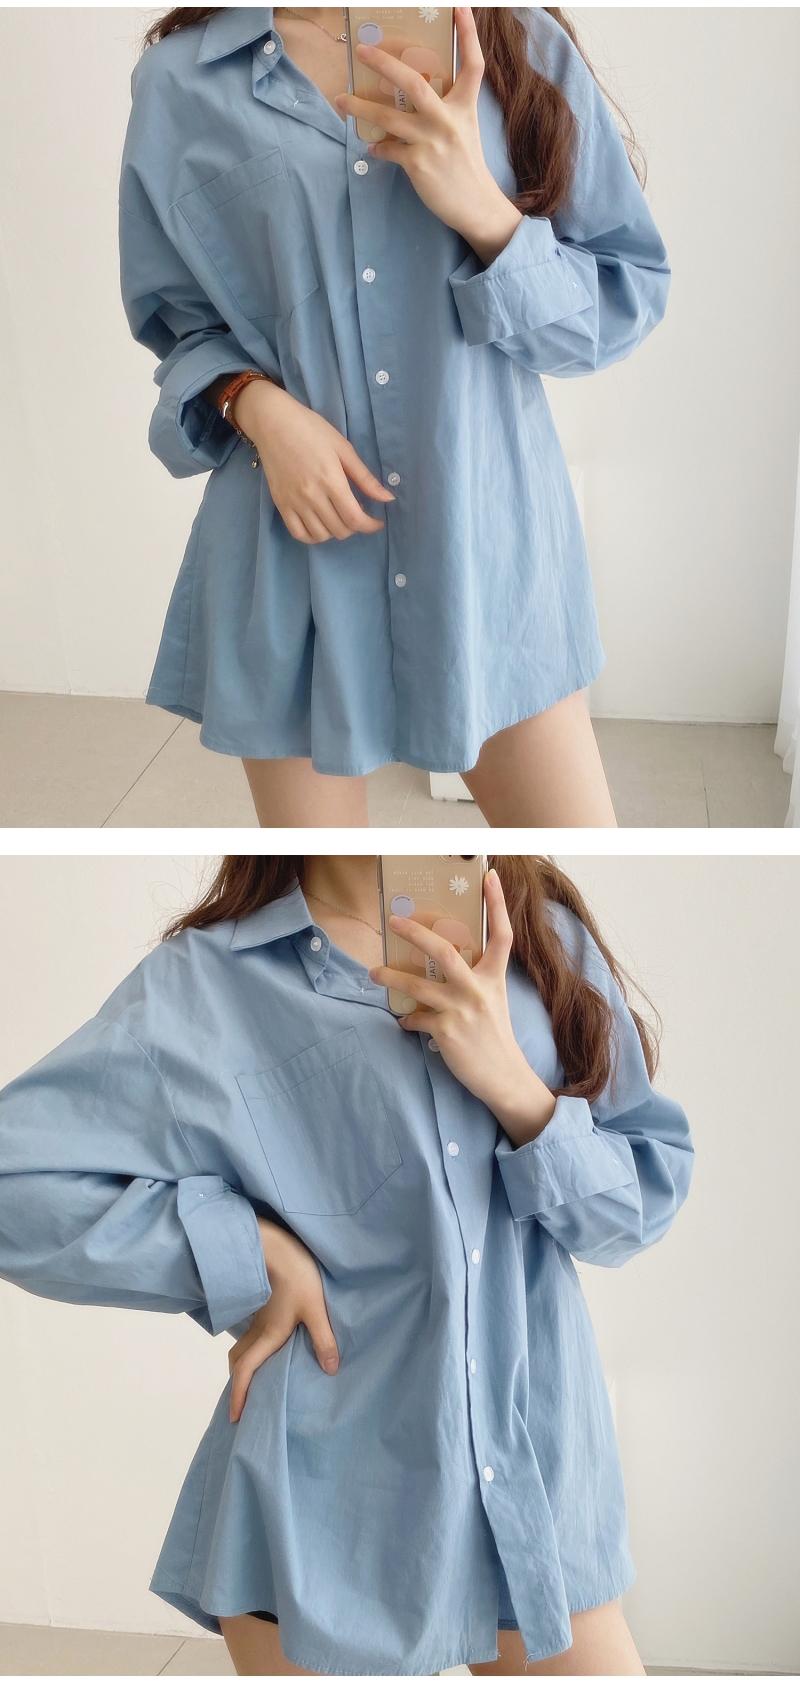 Tycho Cotton Pocket Shirt Shirt Blouse